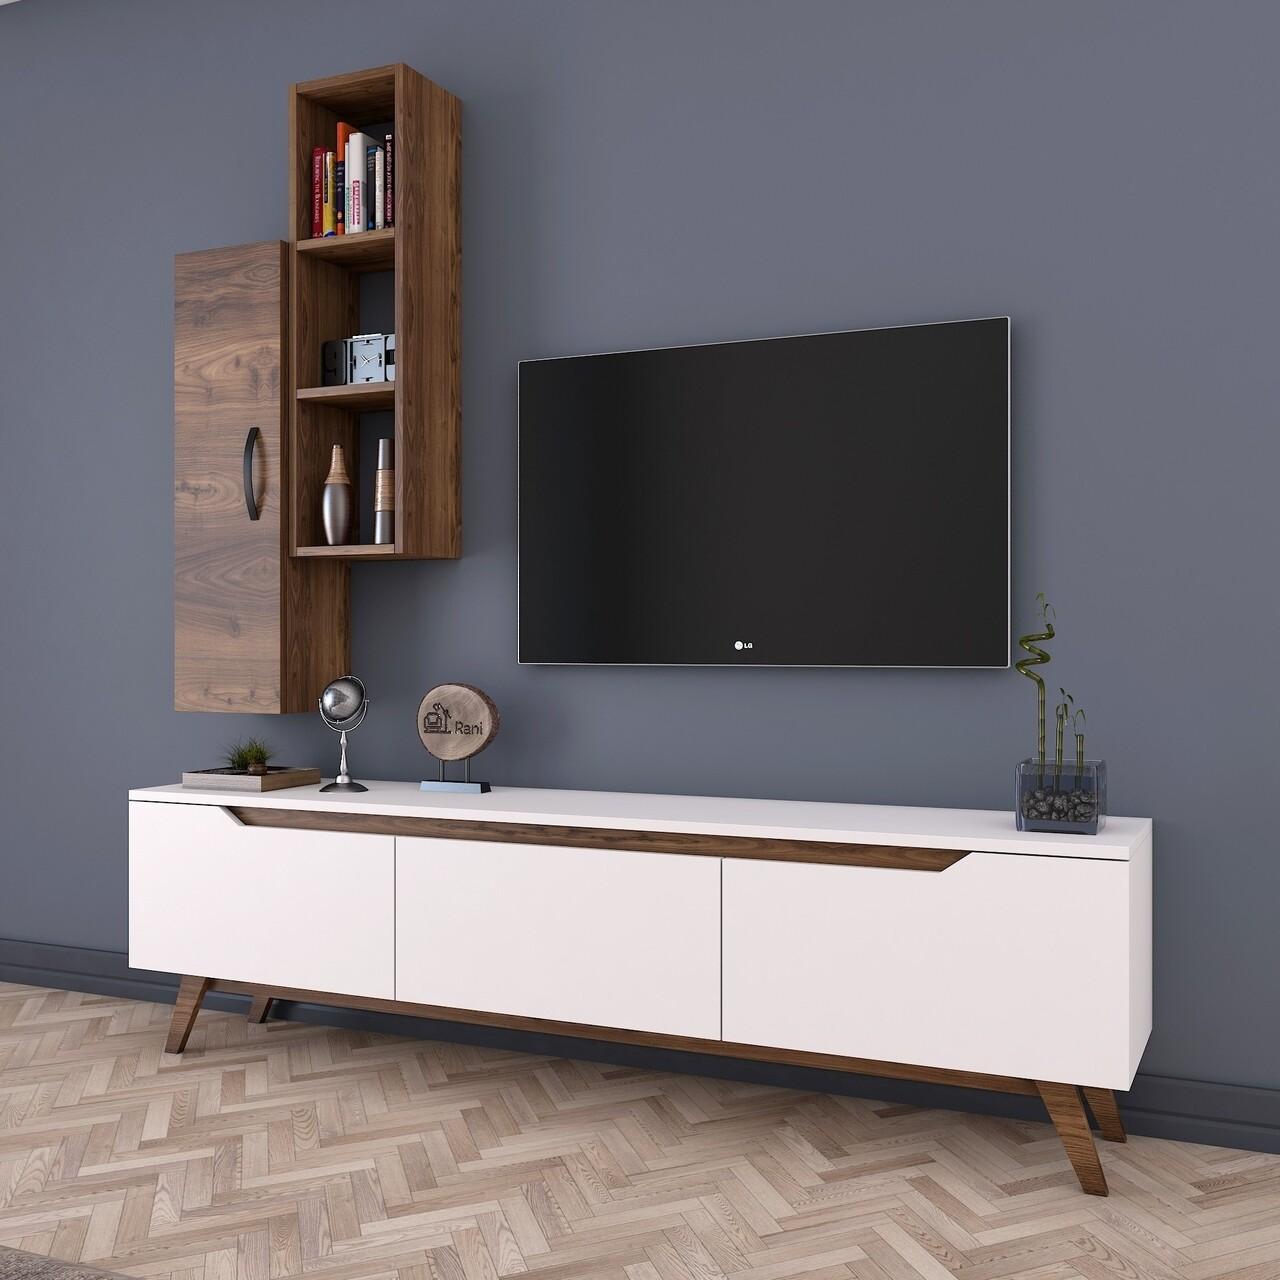 Comoda TV cu raft de perete si cabinet M1 - 796, Wren, 180 x 35 x 48.6 cm/90 cm, white/walnut